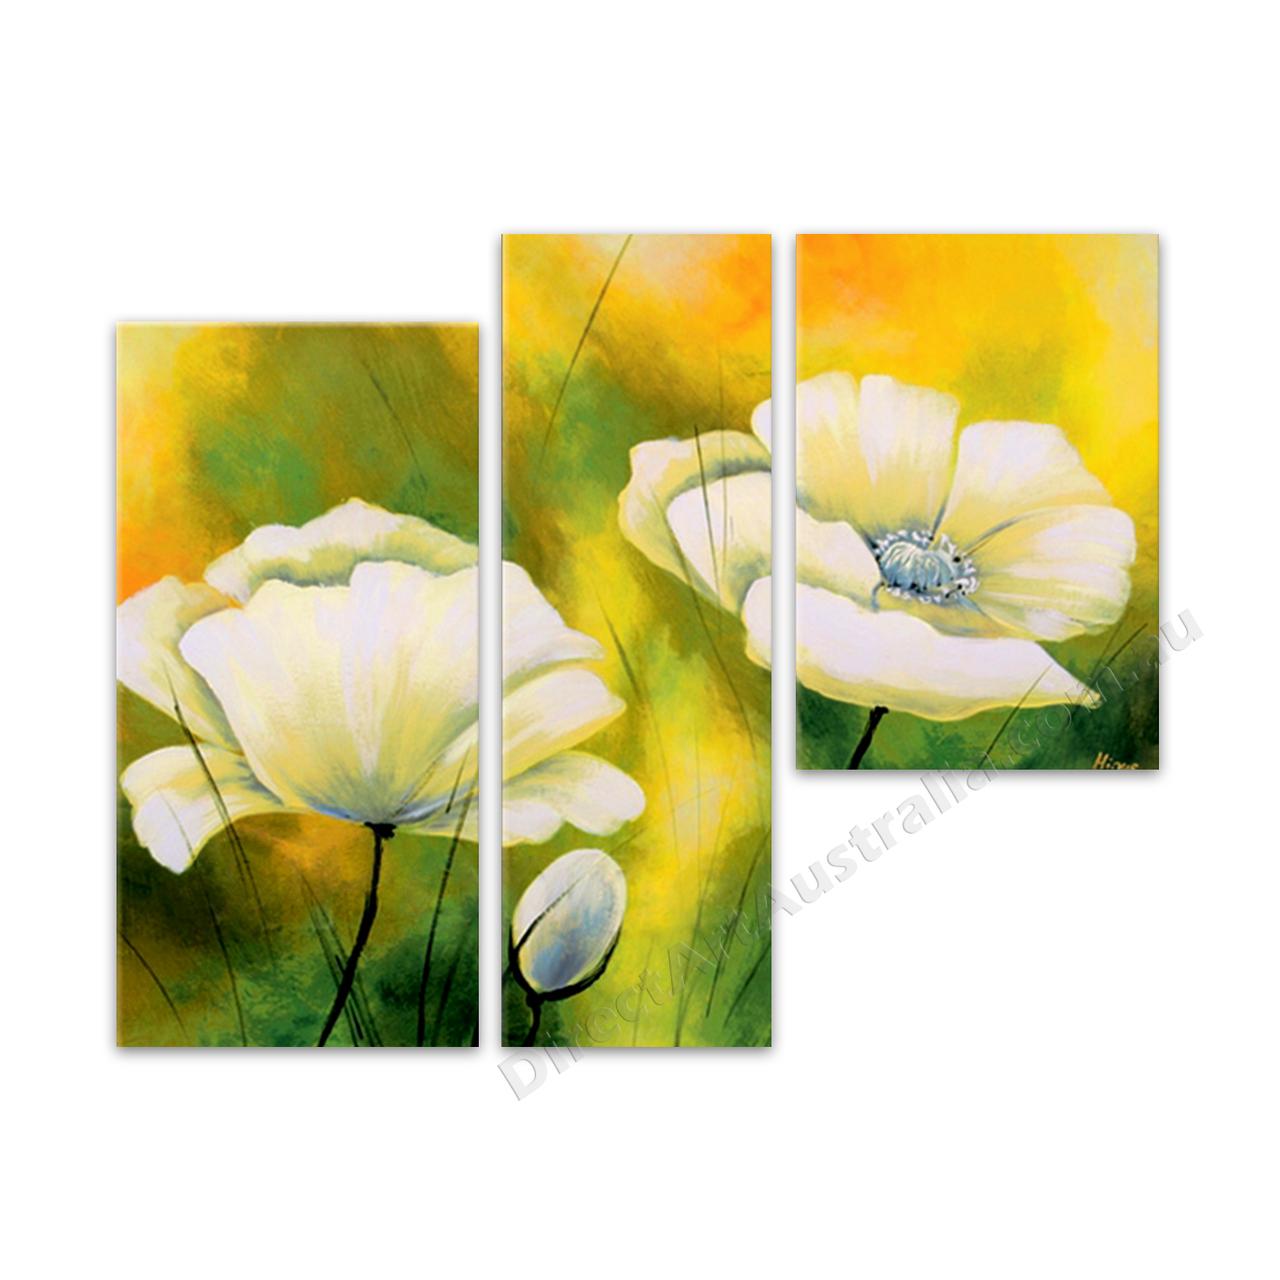 Ponderosa-0204  Best Painting And Interior Design Blogs